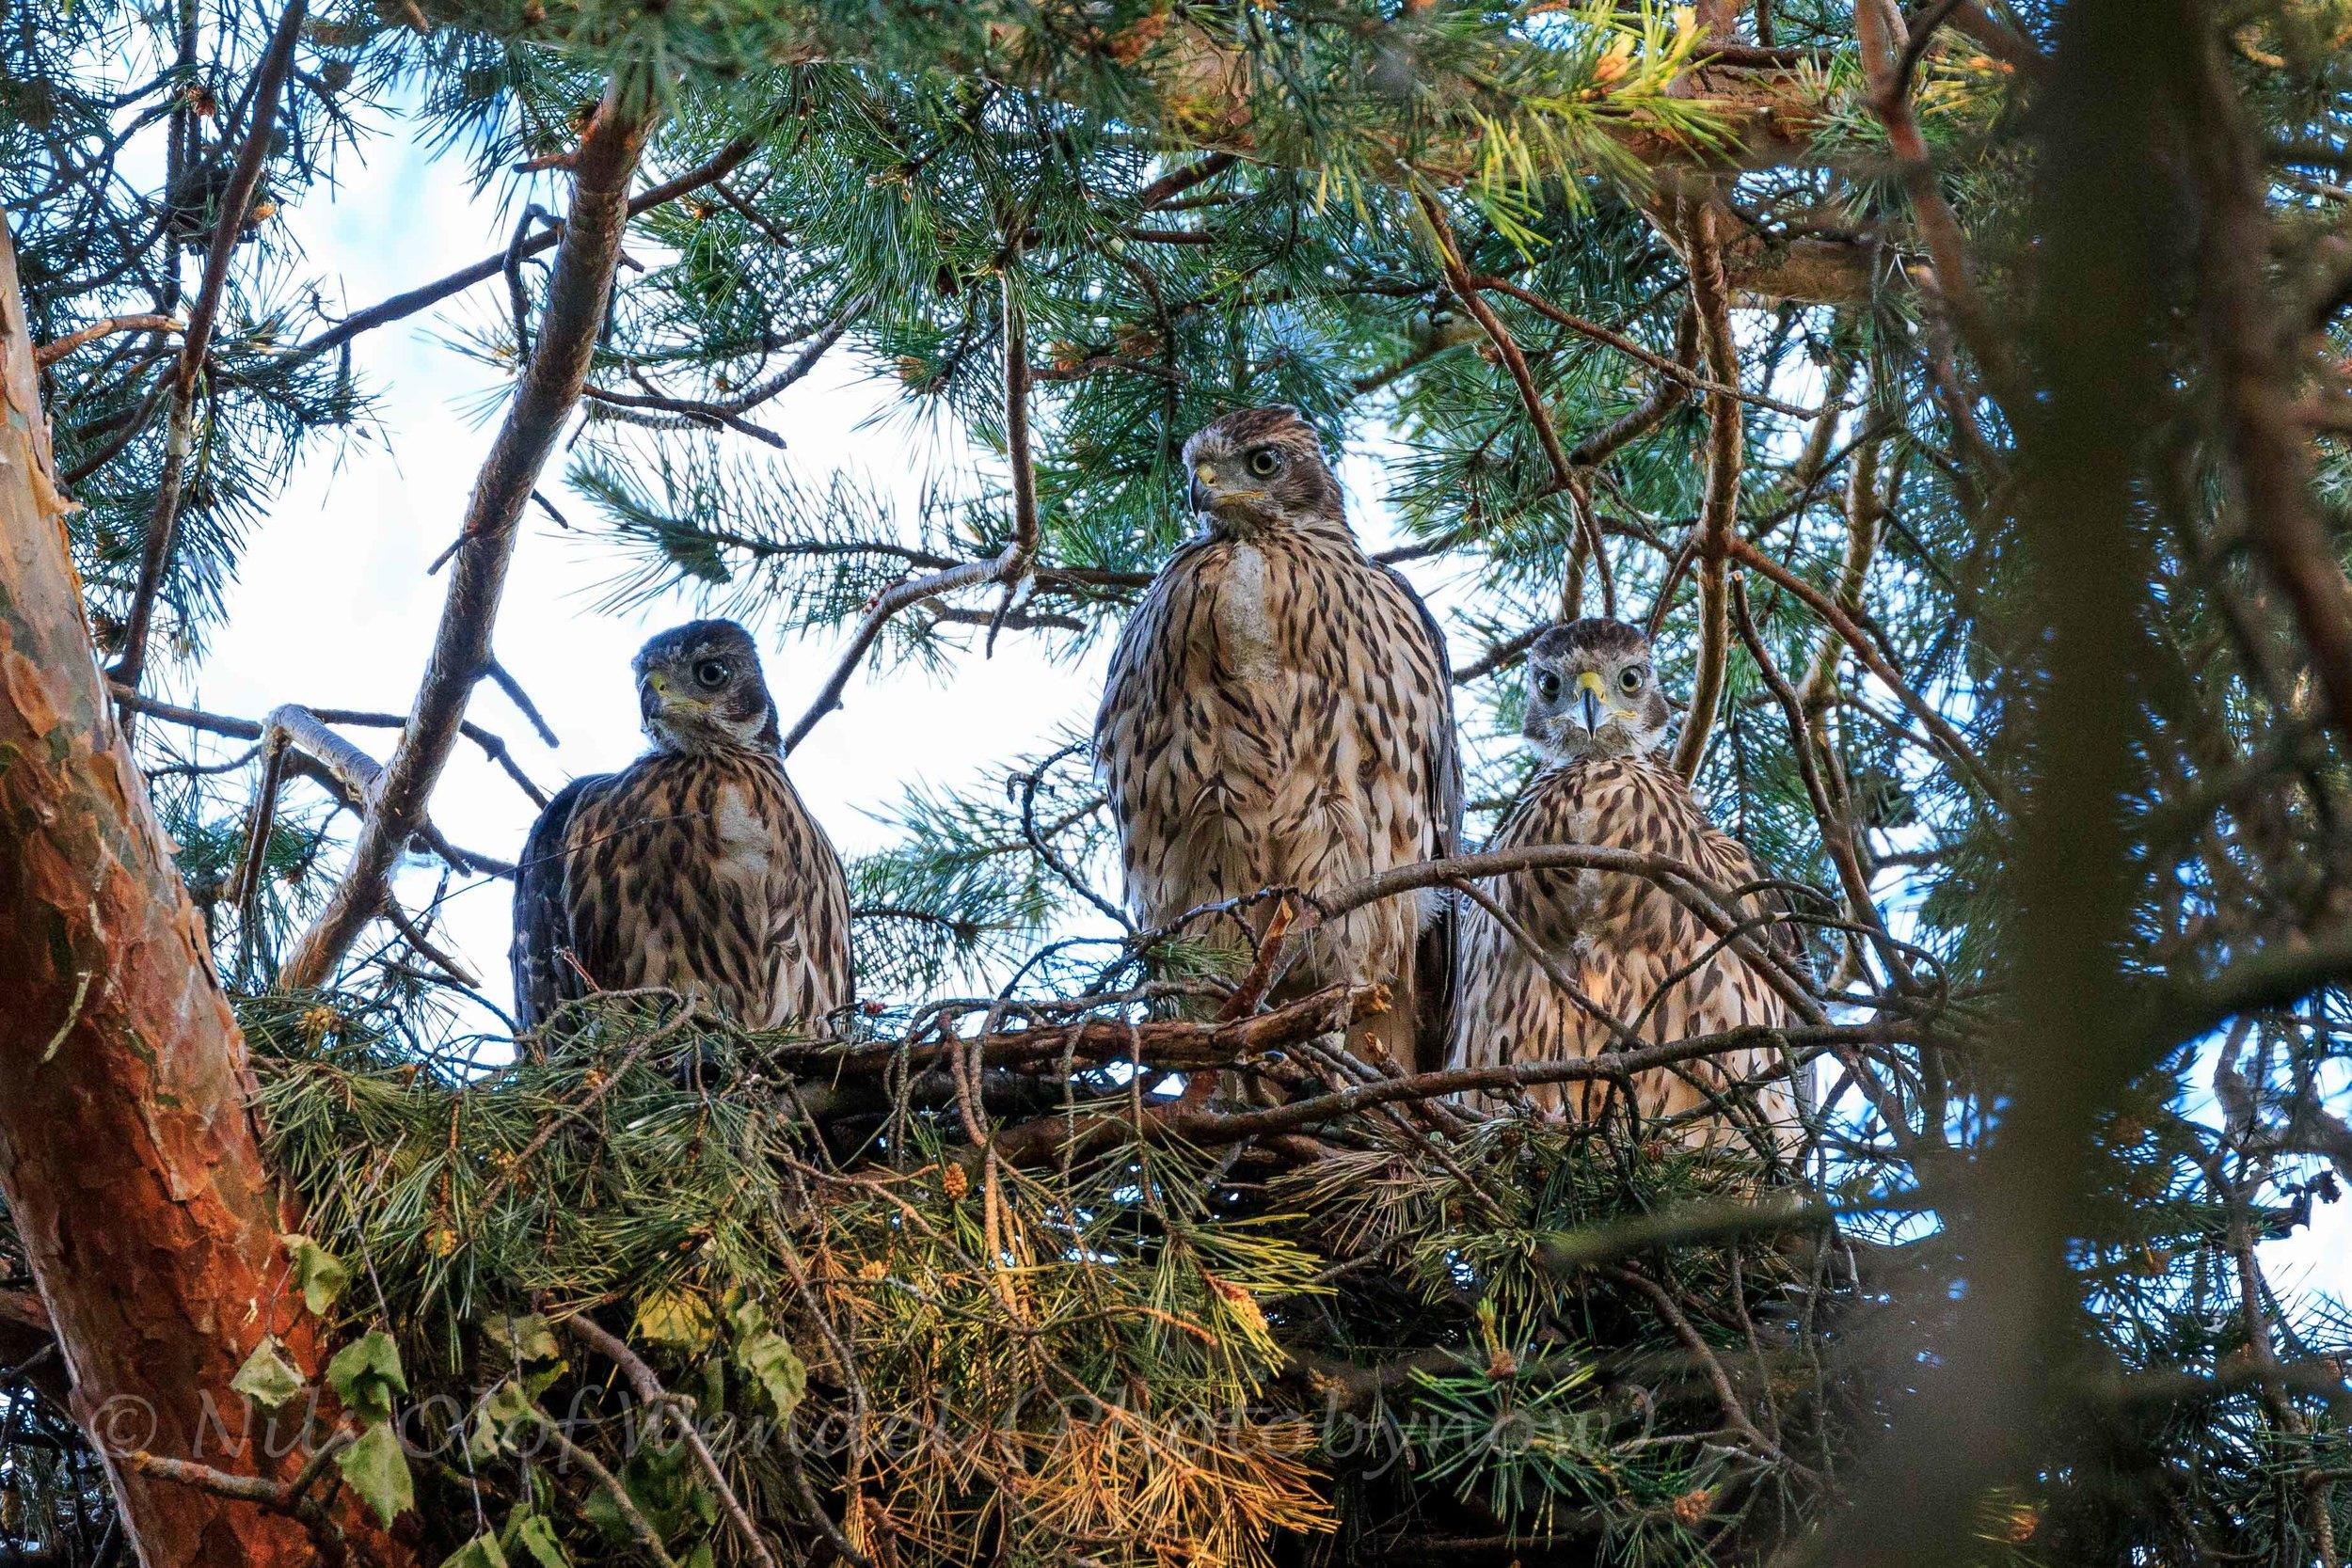 Being watched by three Goshawks.